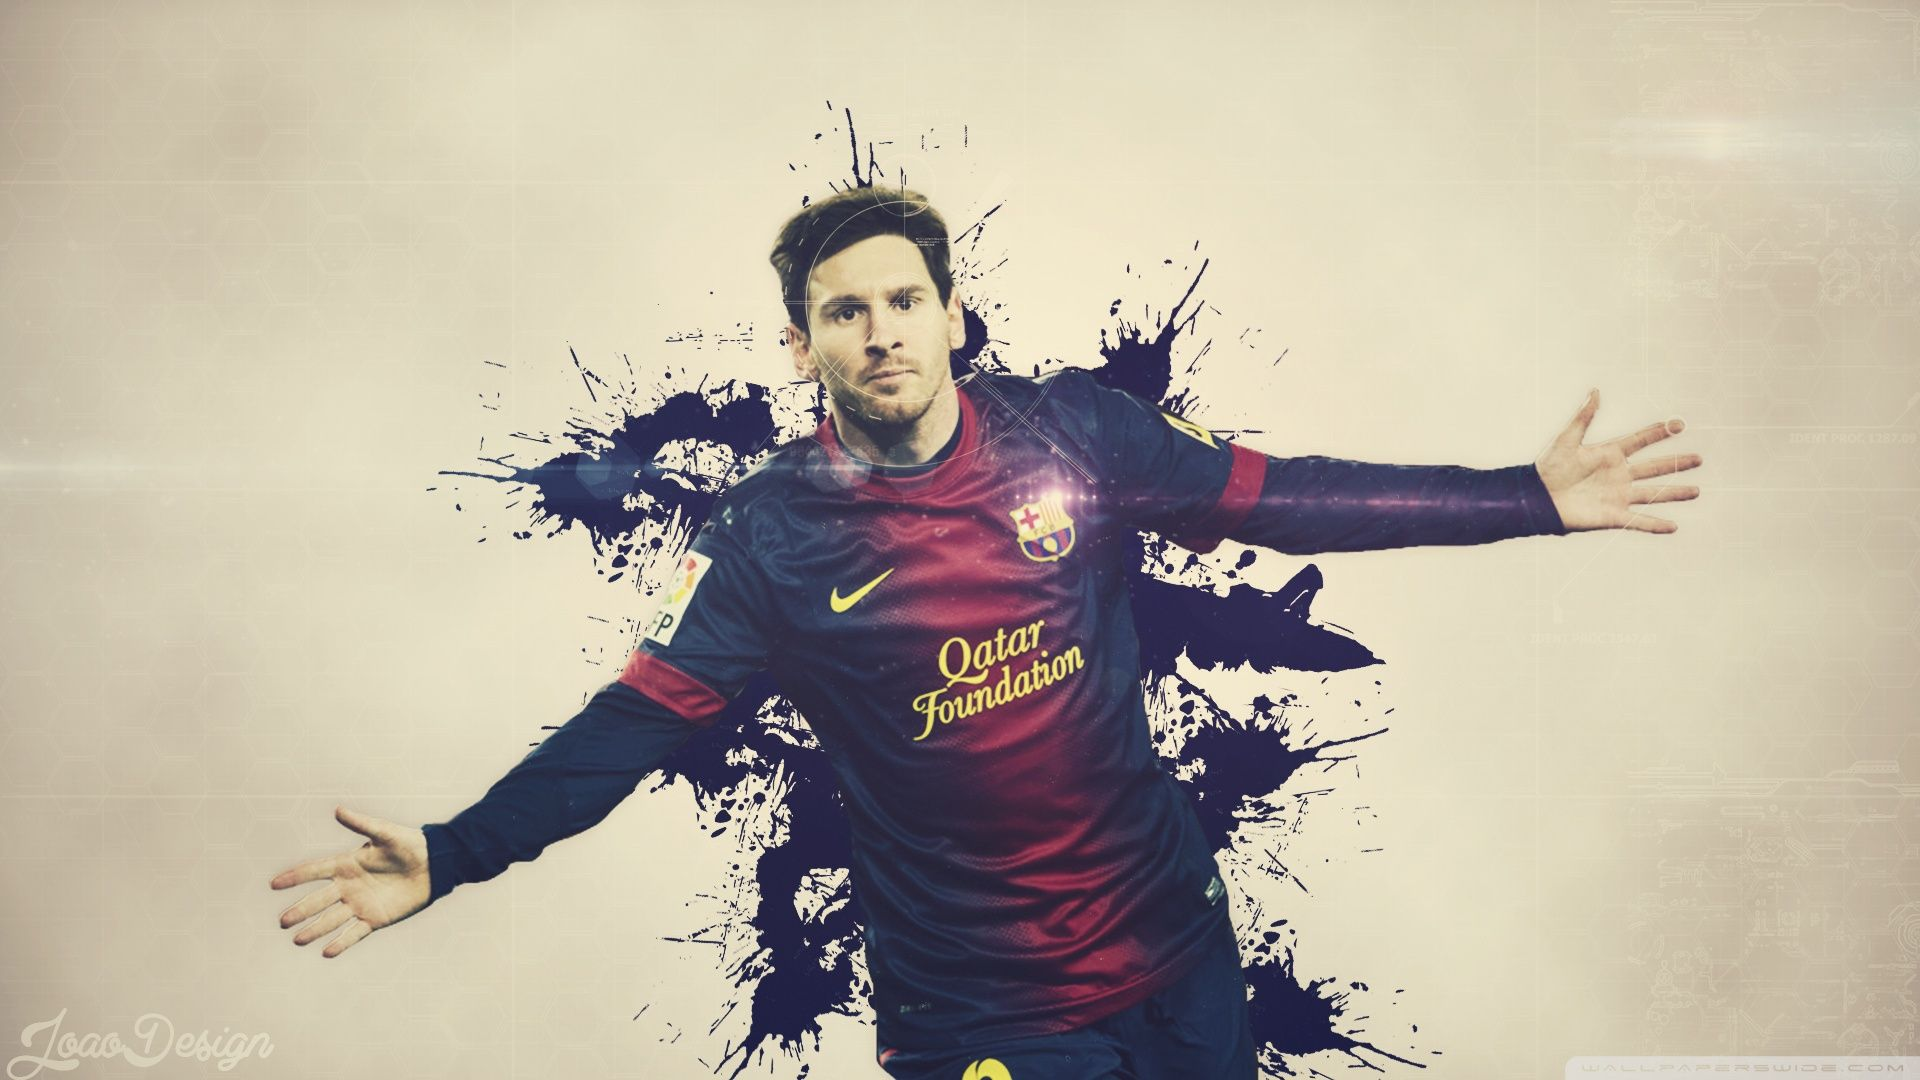 Lionel Messi Wallpaper Hd Best Wallpaper Hd Lionel Messi Wallpapers Lionel Messi Messi Pictures